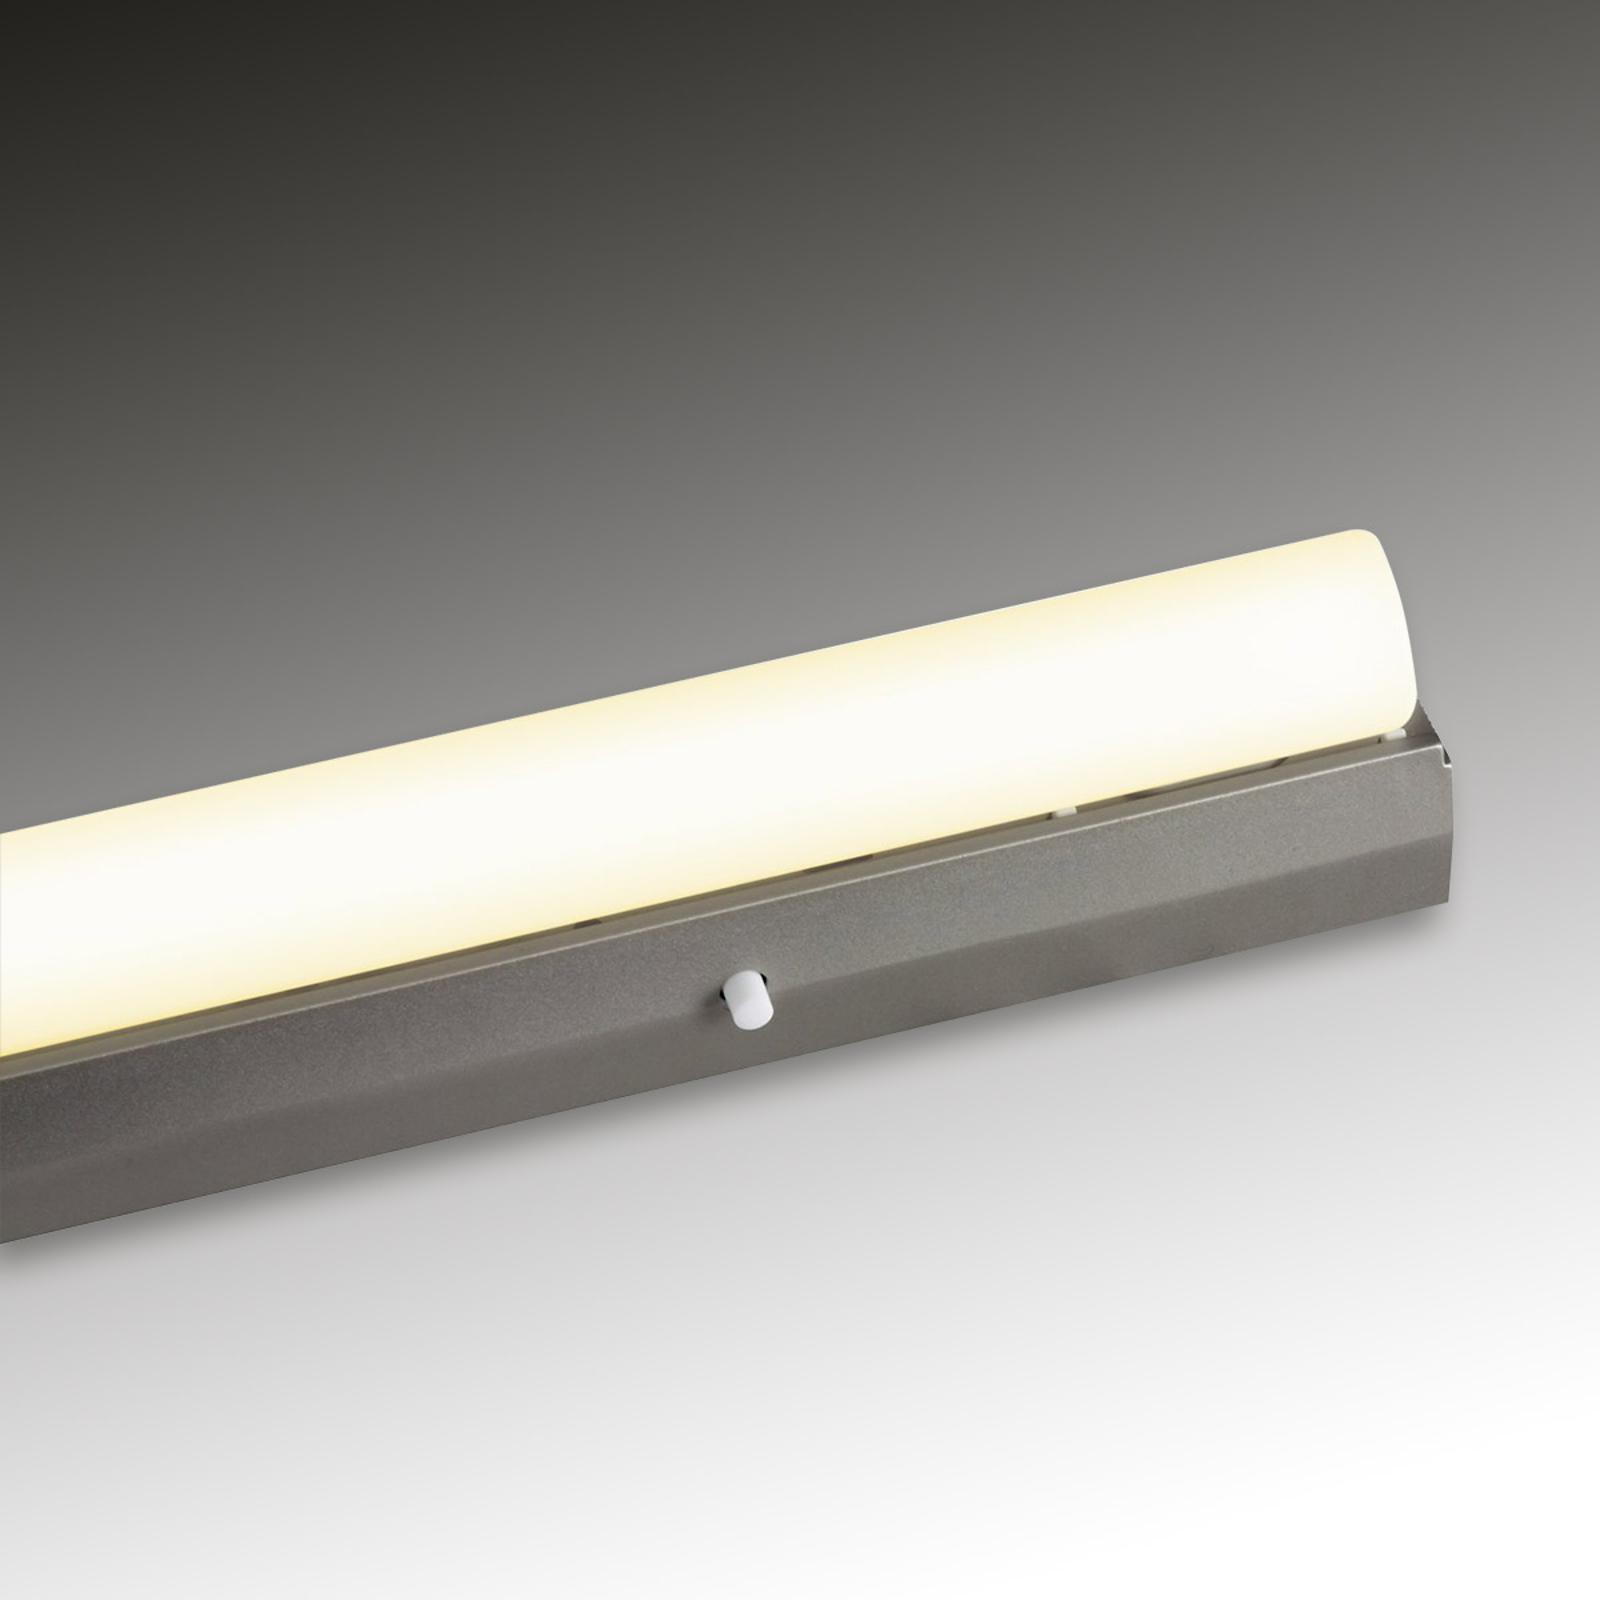 Sølvfarget lyslist vegglampe 60 W